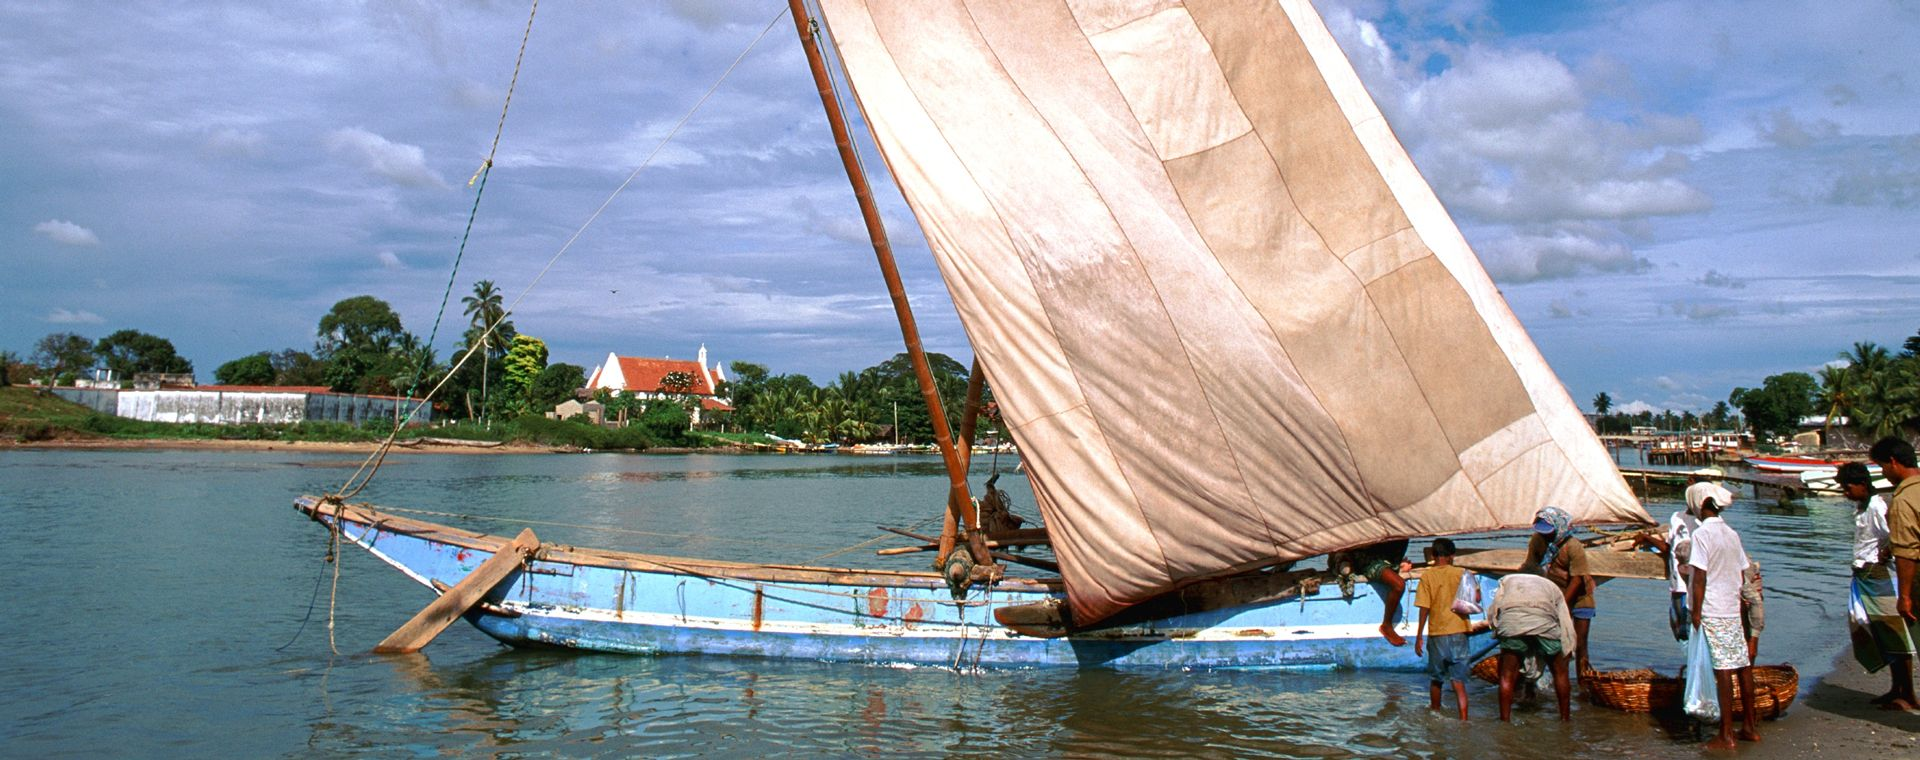 Image Sri Lanka, perle de l'océan Indien